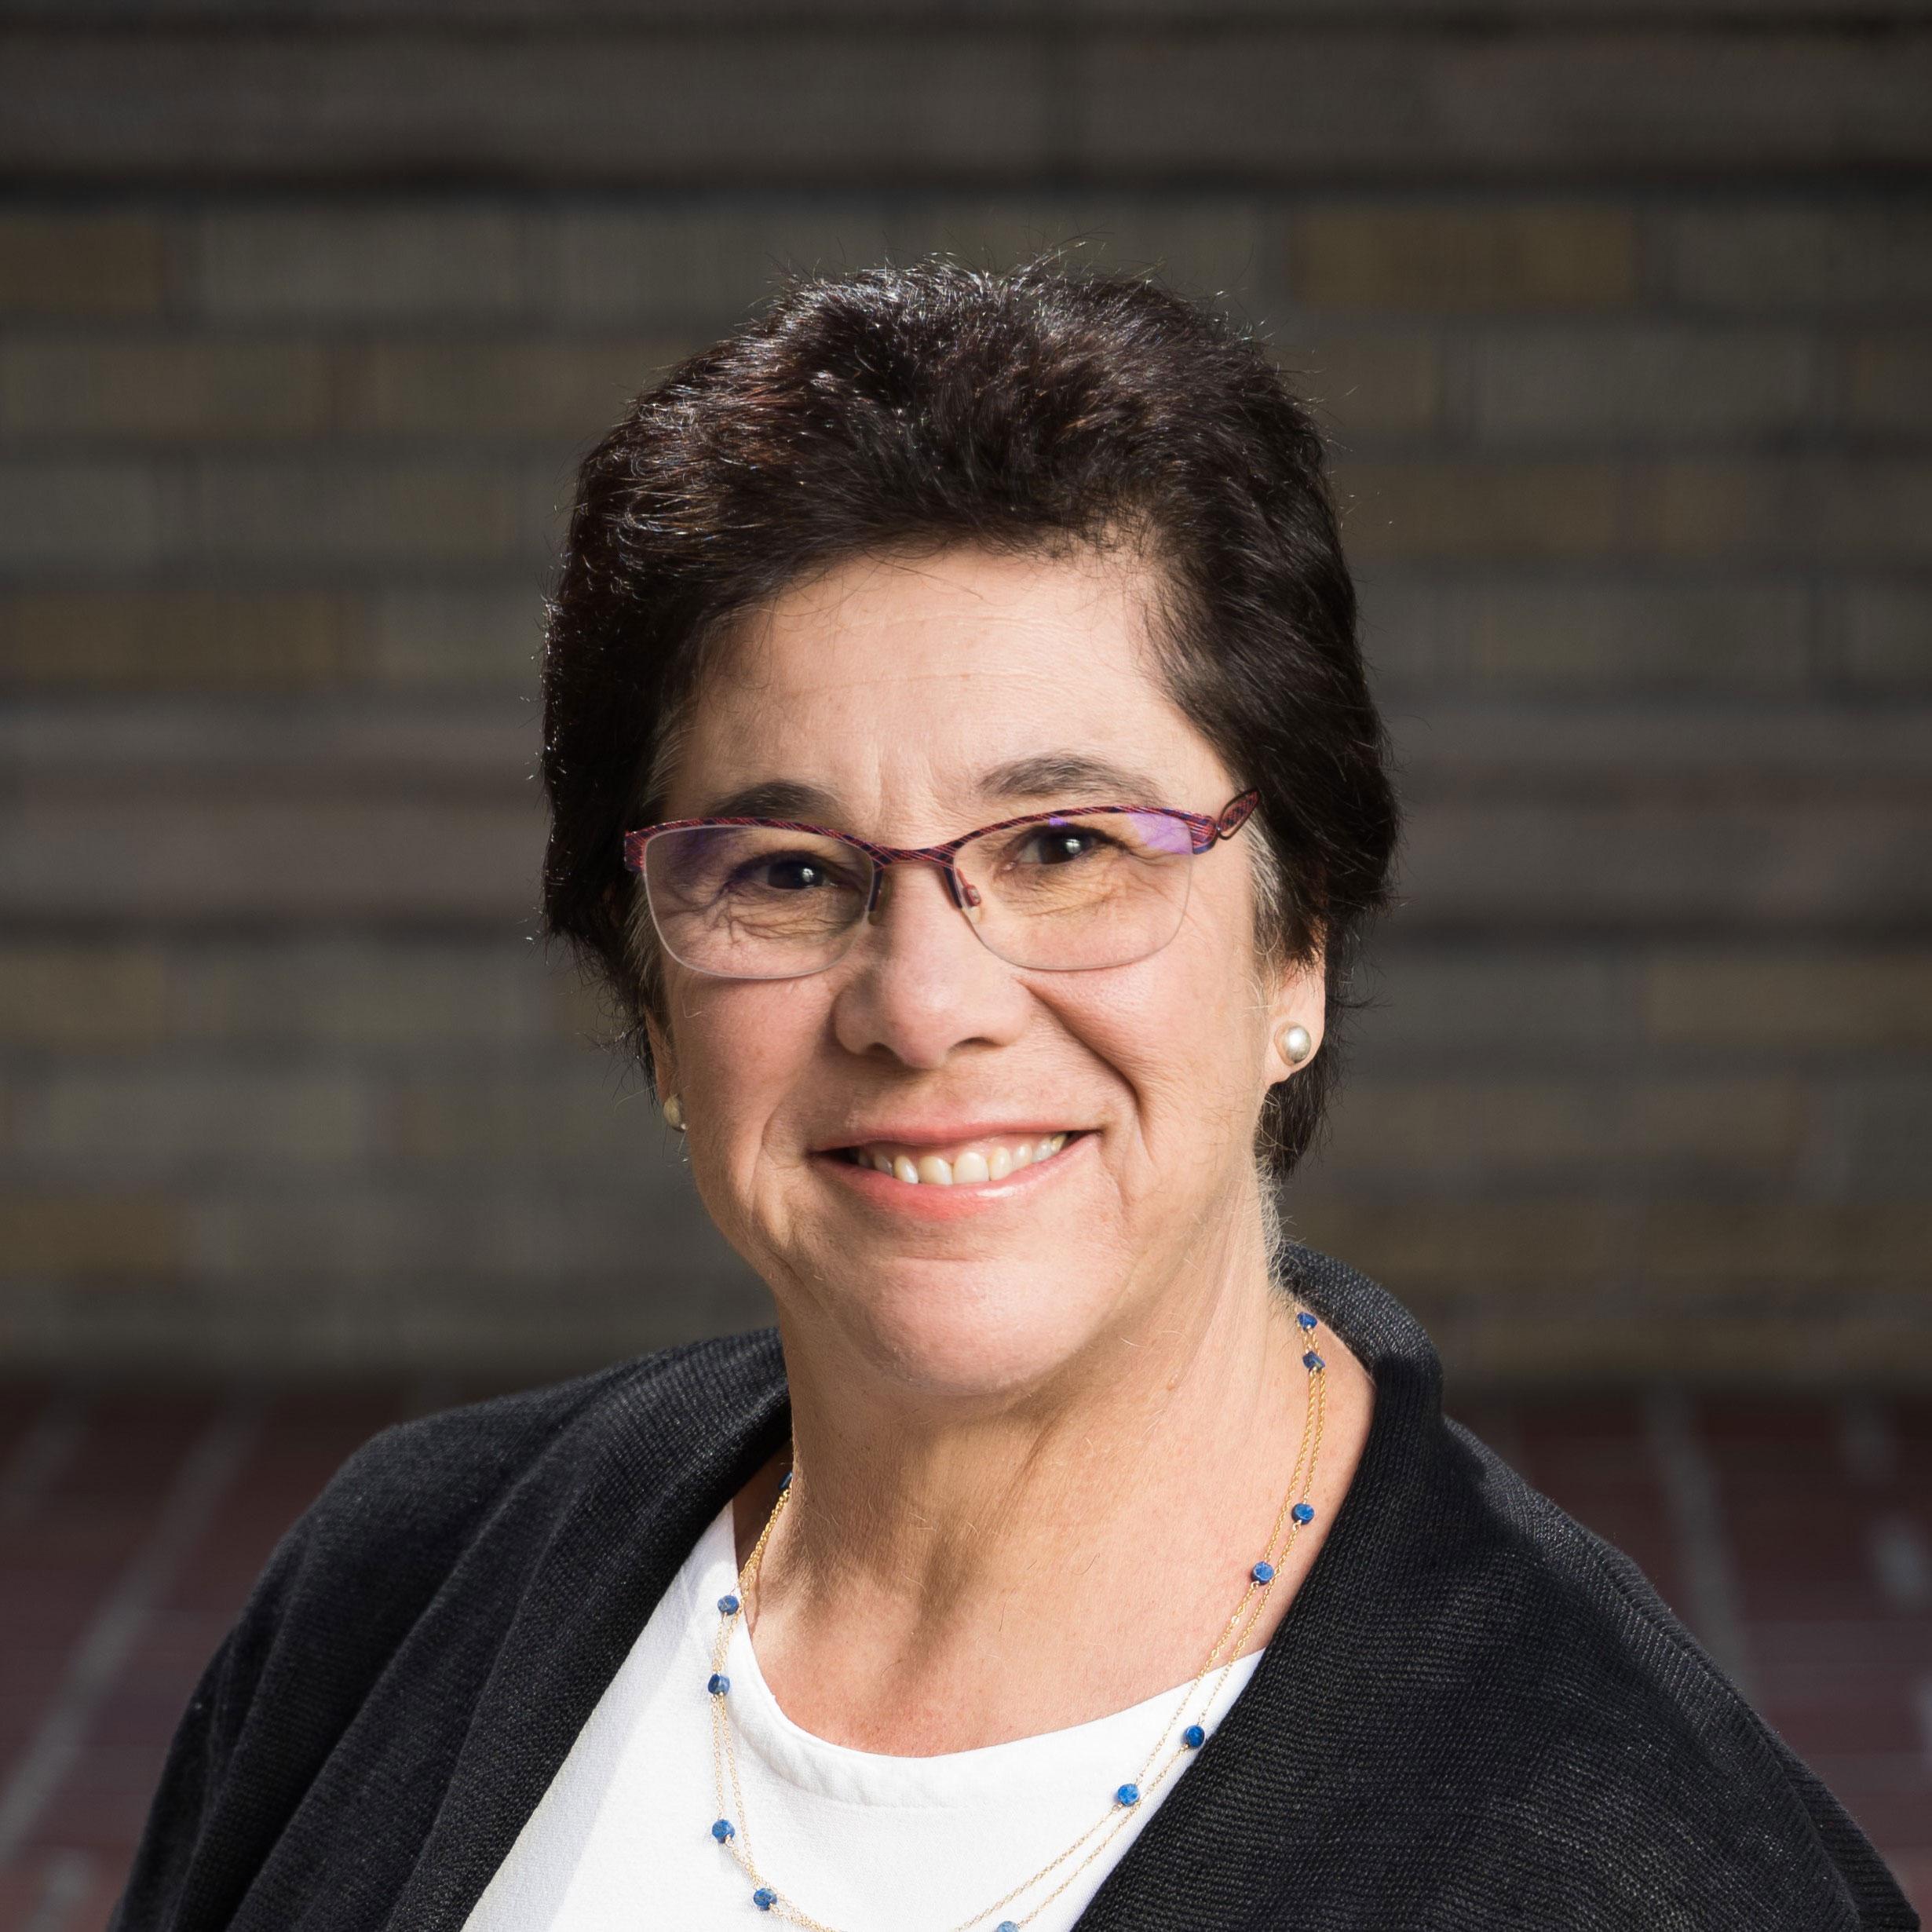 Melanie Fried-Oken, Ph.D.